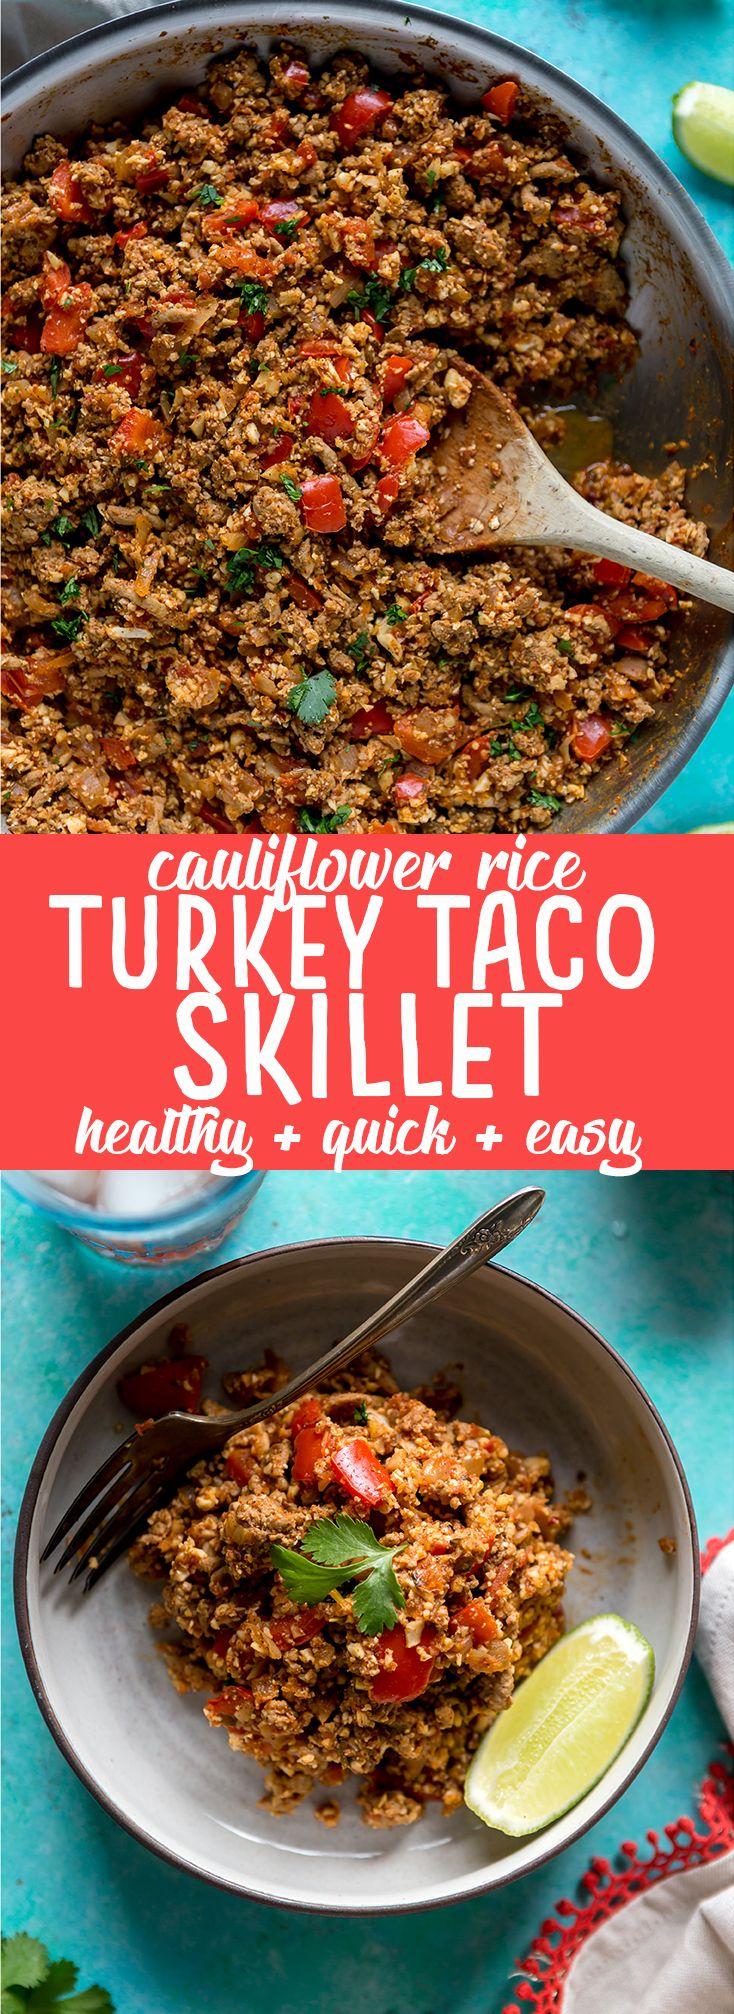 Healthy Cauliflower Rice Turkey Taco Skillet